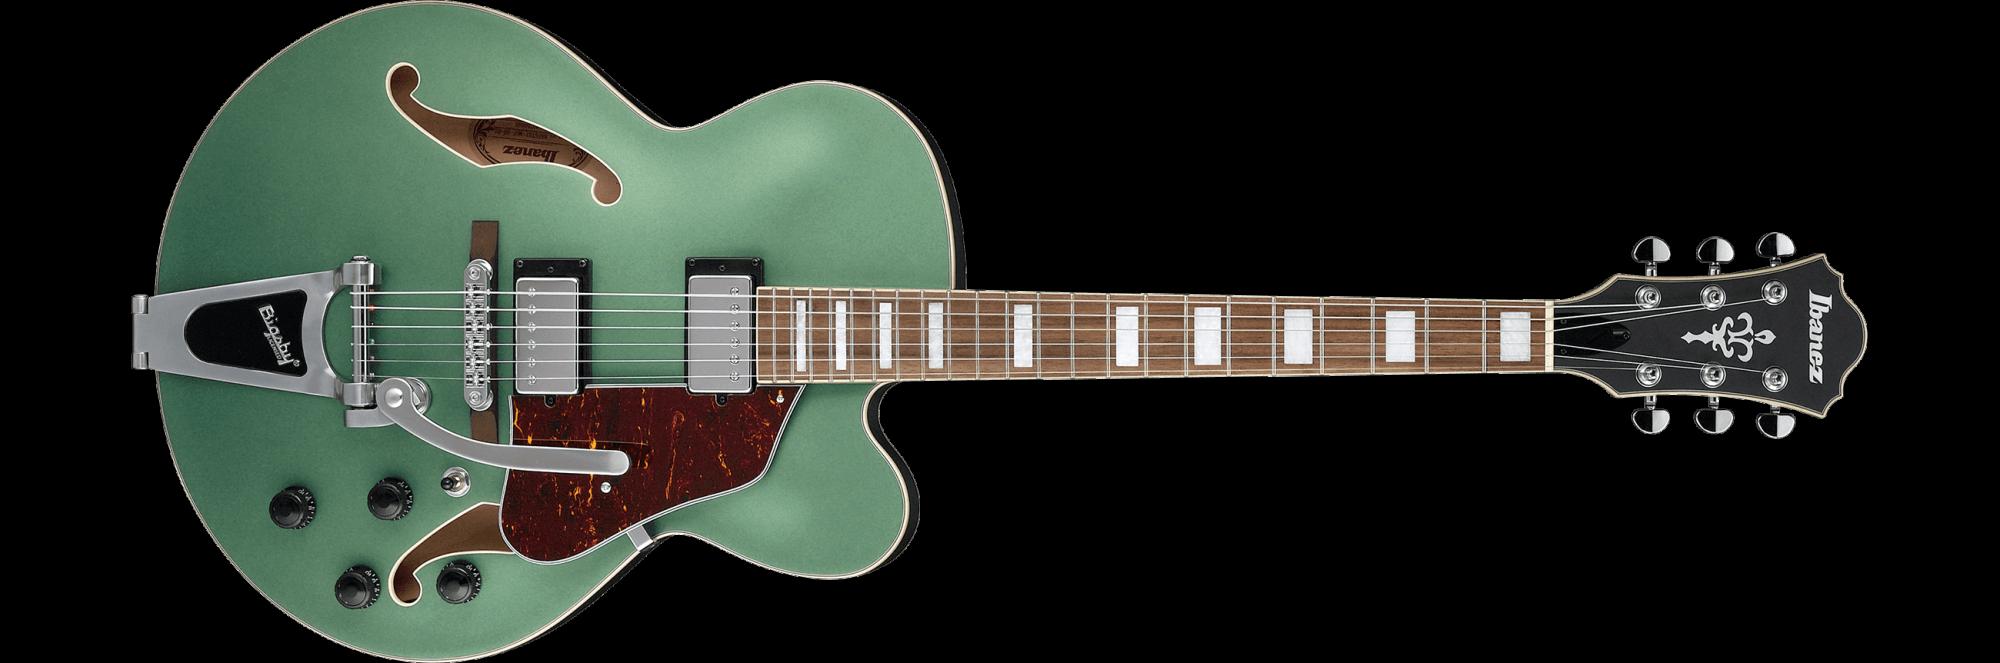 Ibanez AFS75T-MGF Artcore Hollow Linden Body - Metallic Green Flat